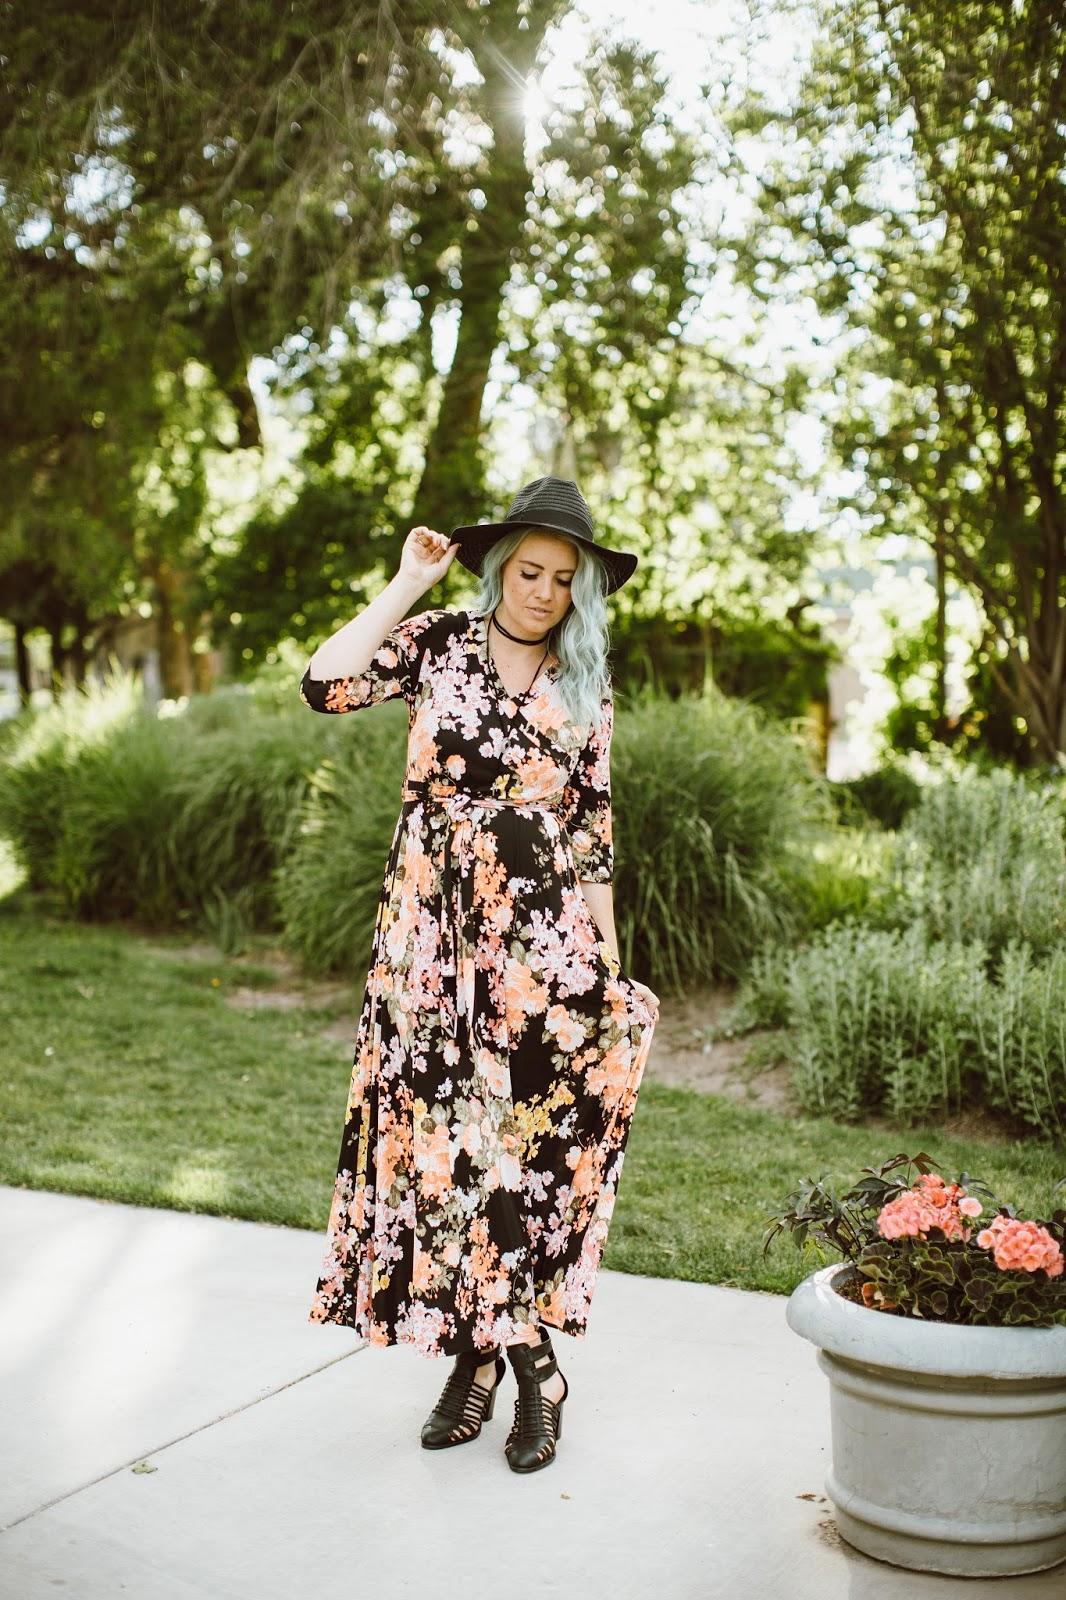 Nursing Friendly, Mint Hair, Floral Dress